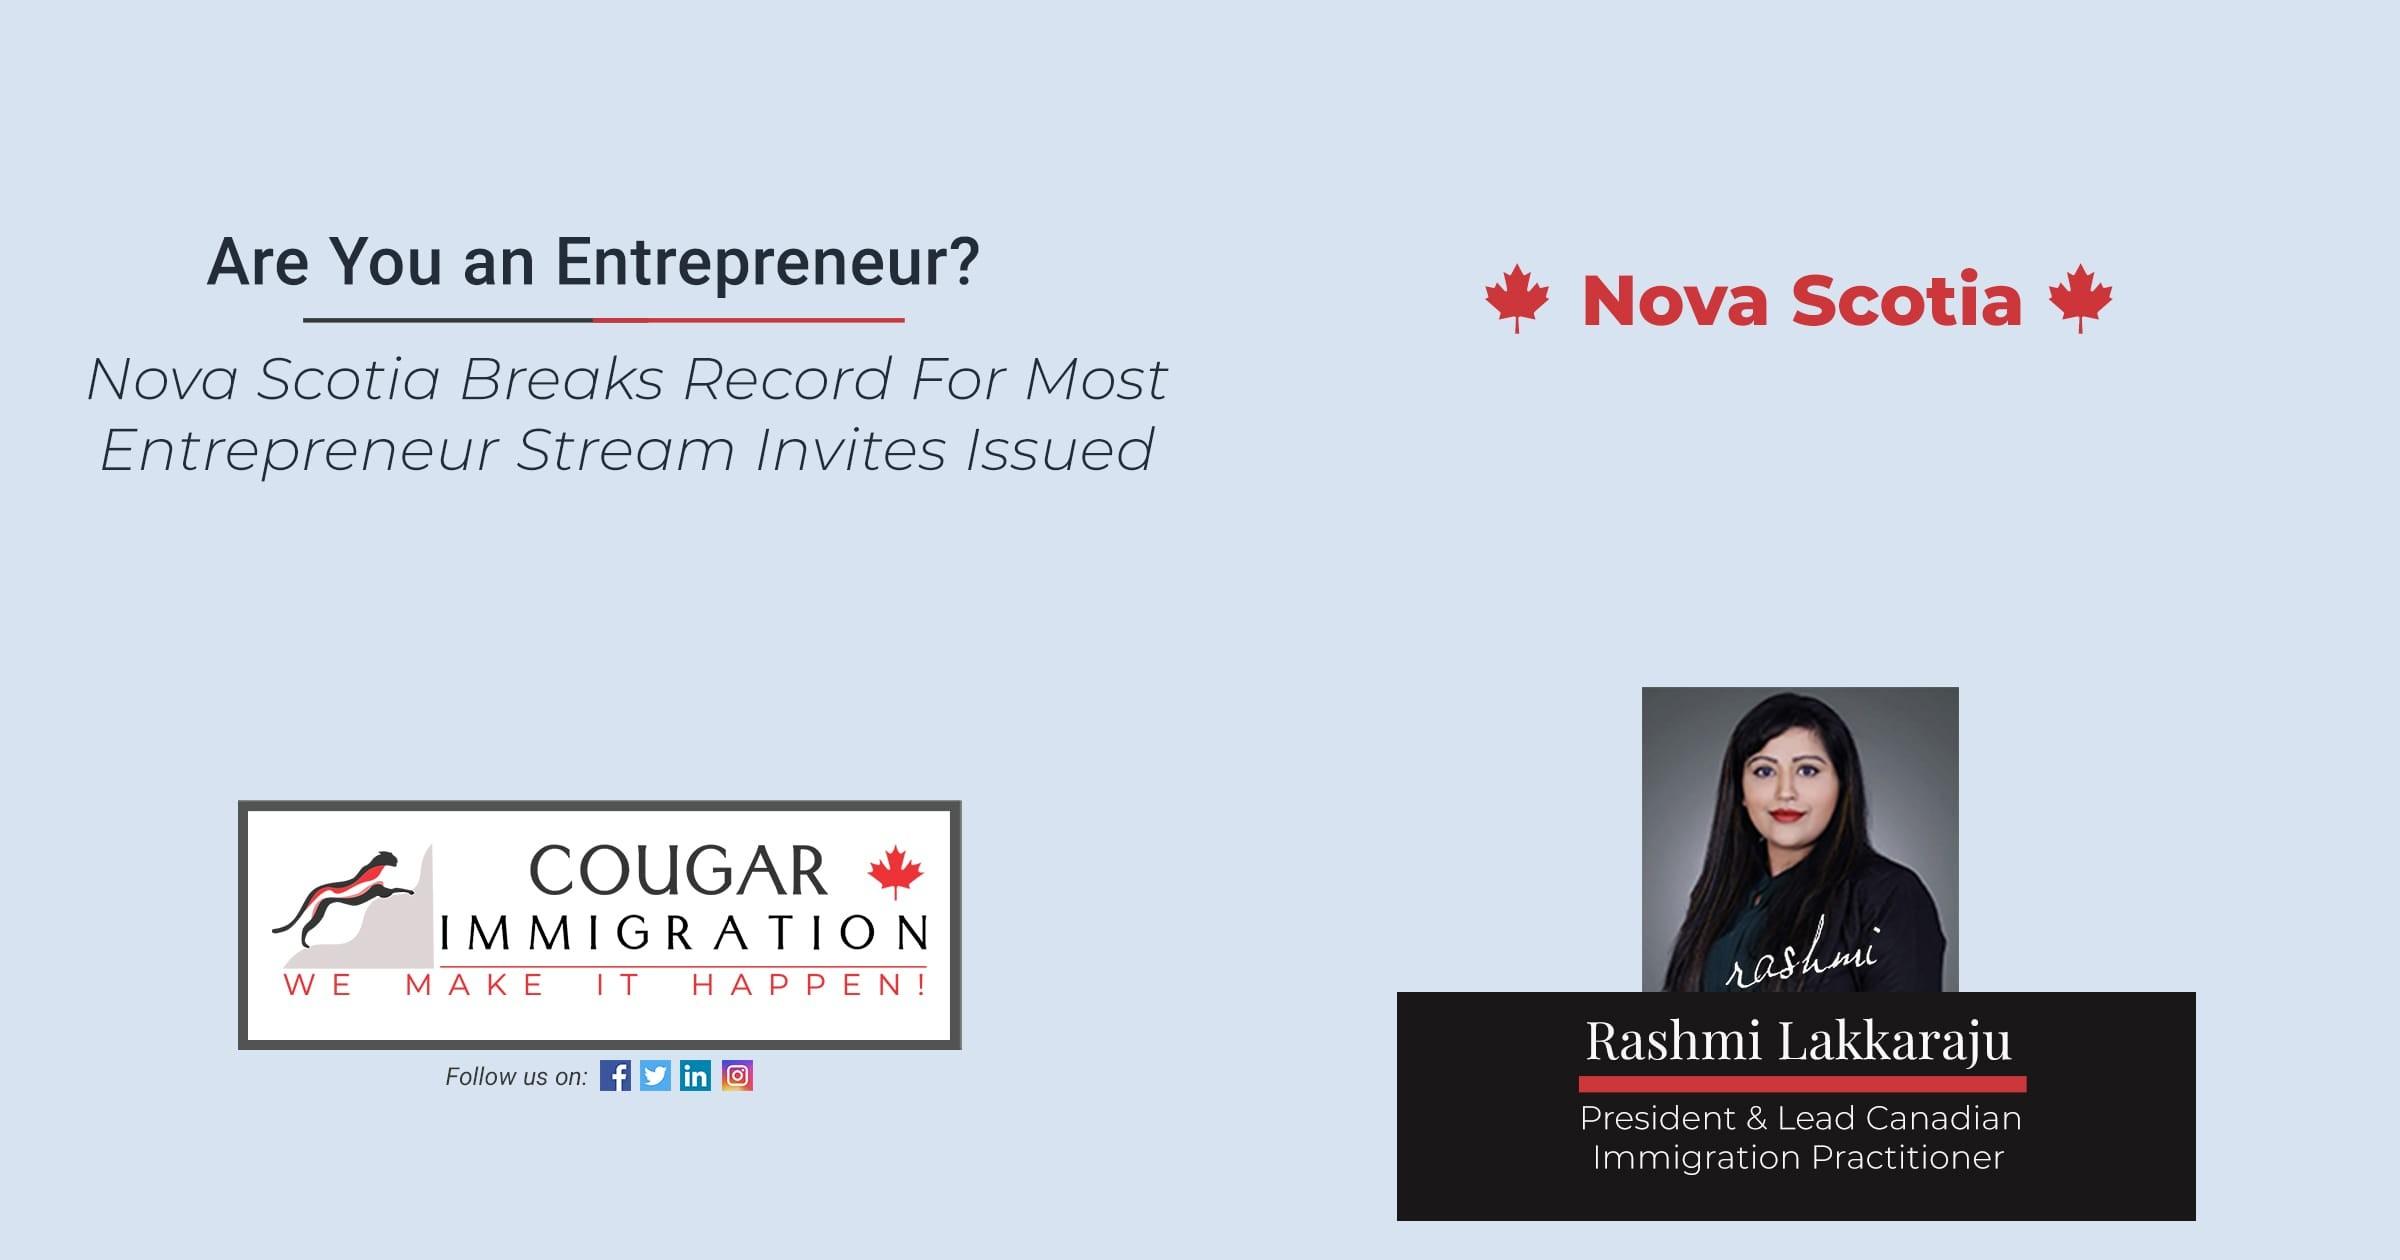 Nova Scotia Breaks Record For Most Entrepreneur Stream Invites Issued thumbnail